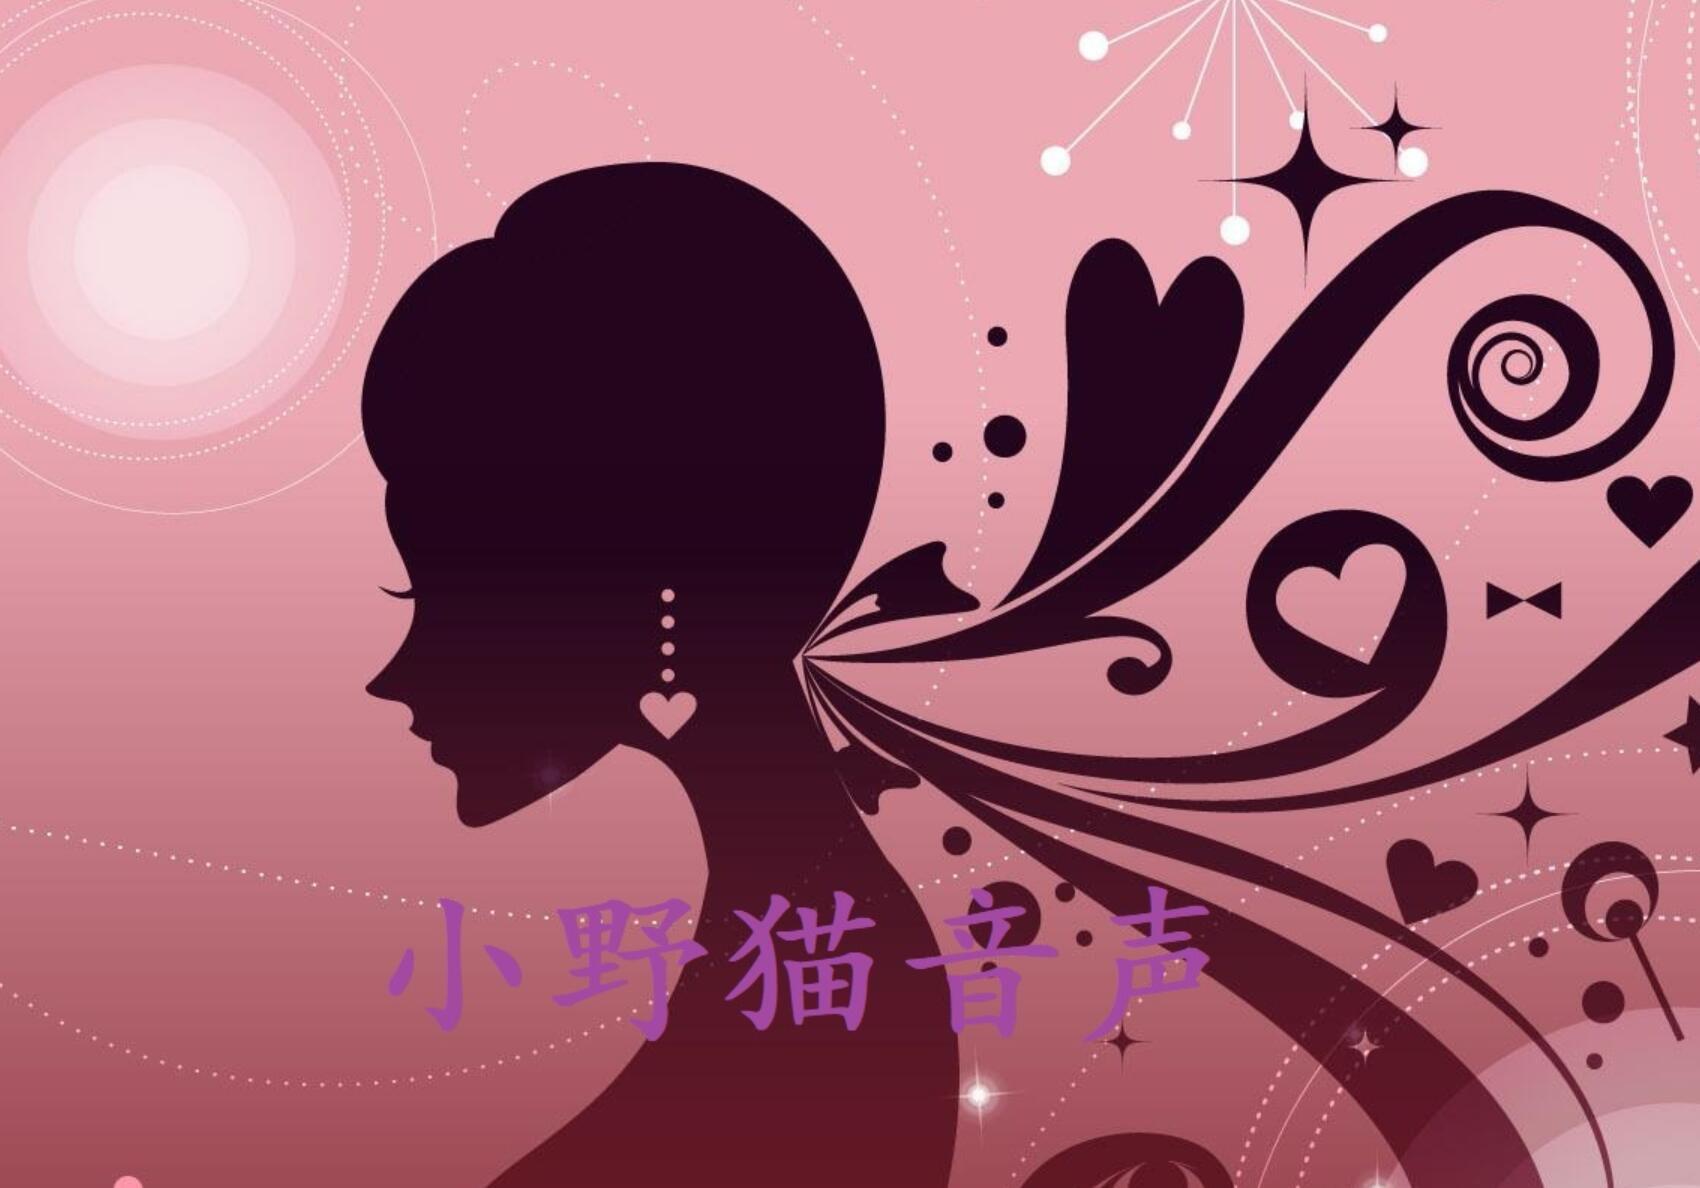 RJ330230 小野猫音声 女教师的七天征服  CV嫣然 [20210607]